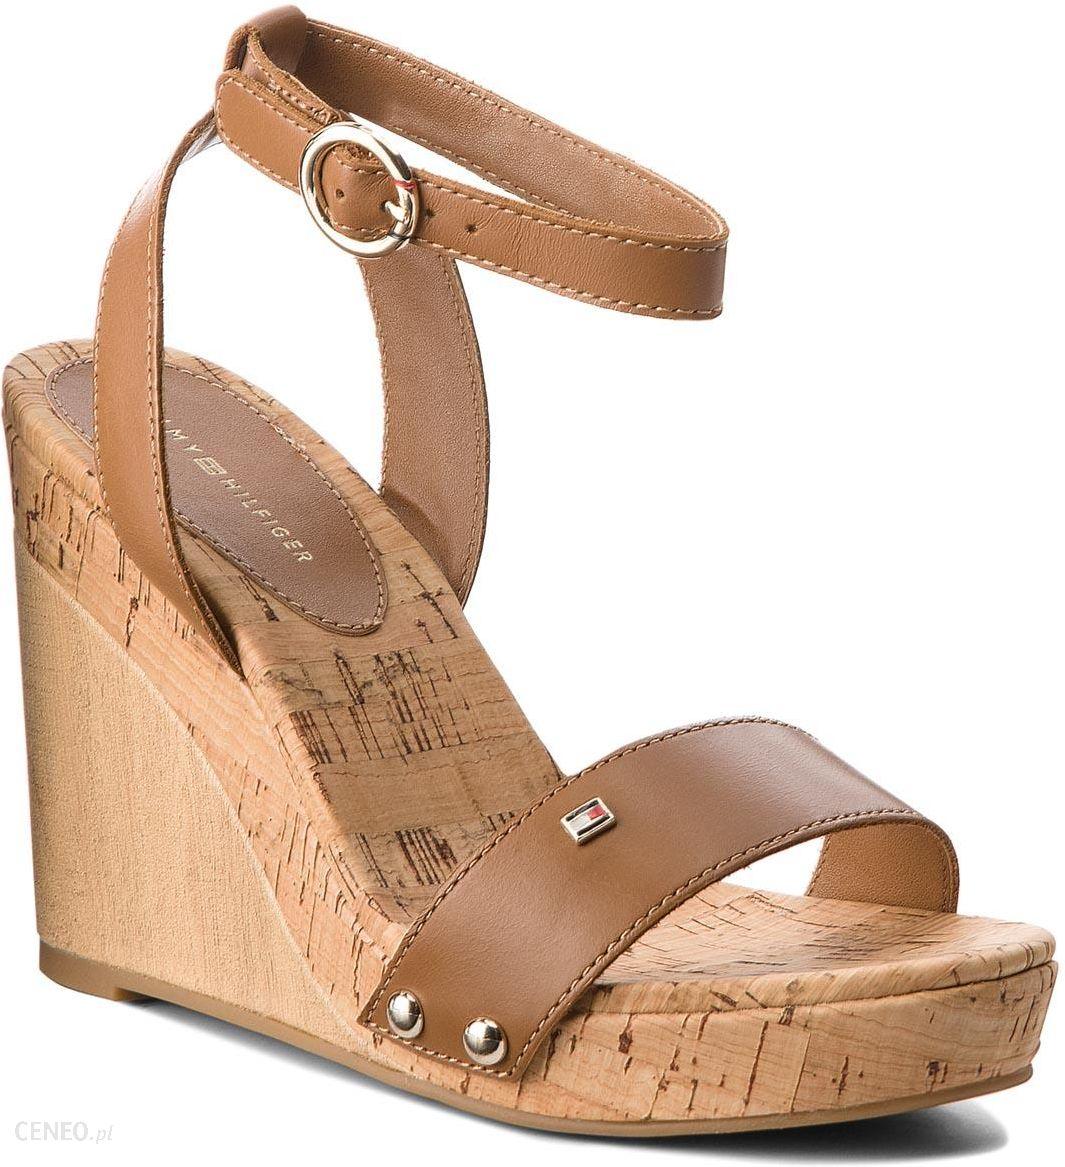 ef1d1cc951150 Sandały TOMMY HILFIGER - Iconic Elena Leather Straps FW0FW02097 Summer  Cognac 929 - zdjęcie 1